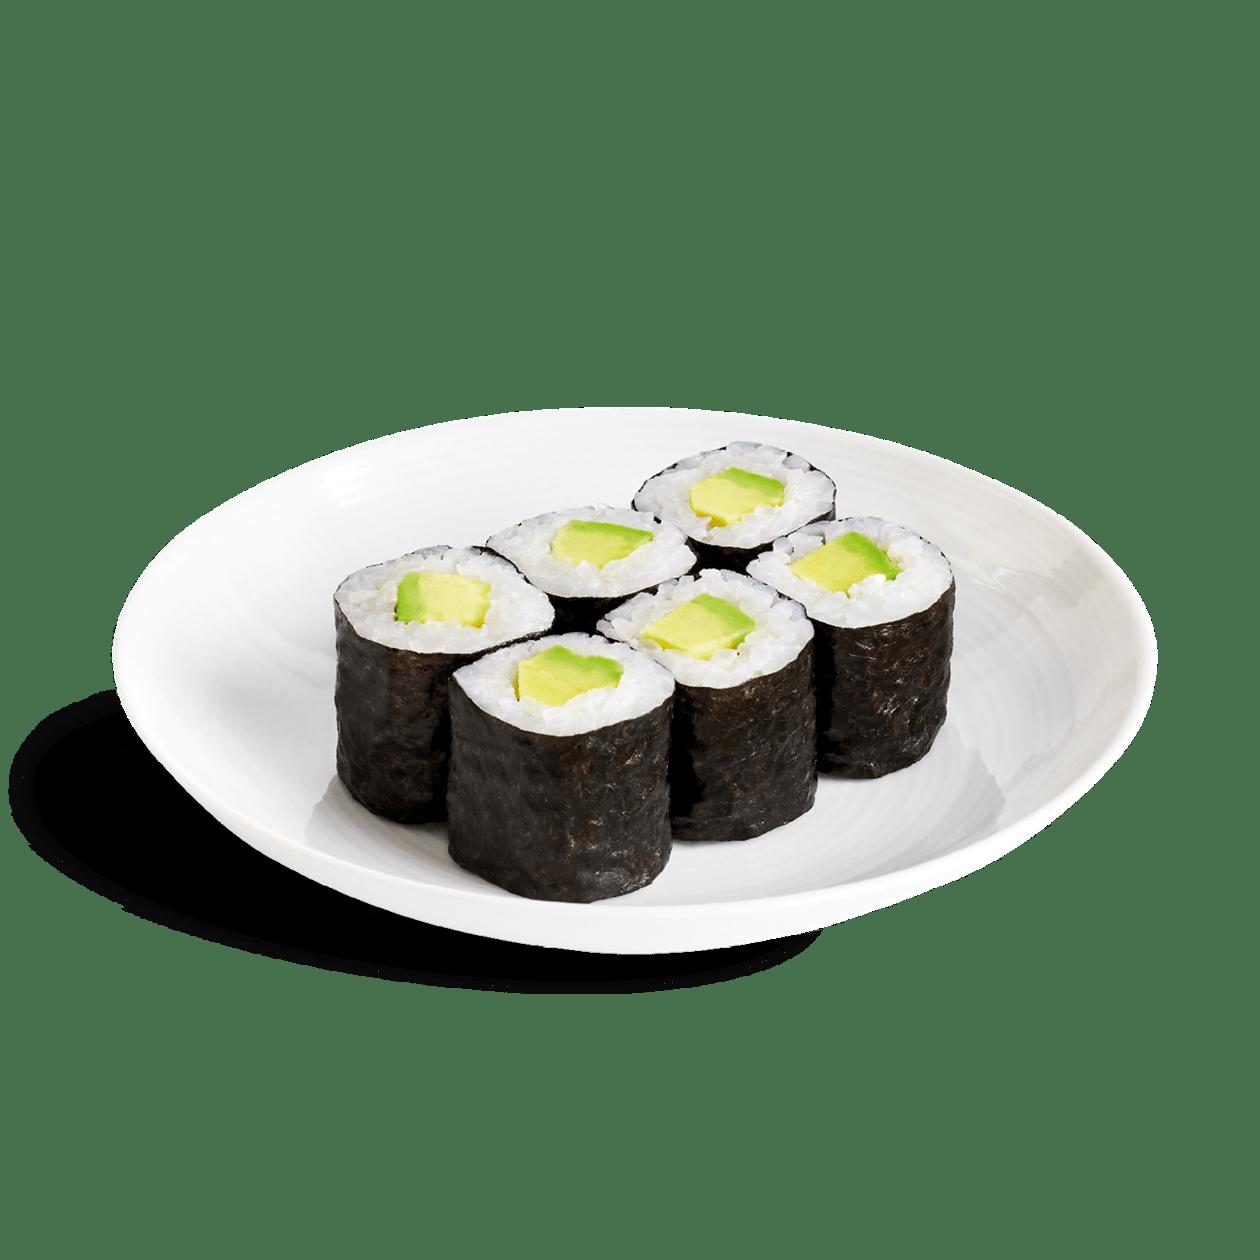 Avocado Maki